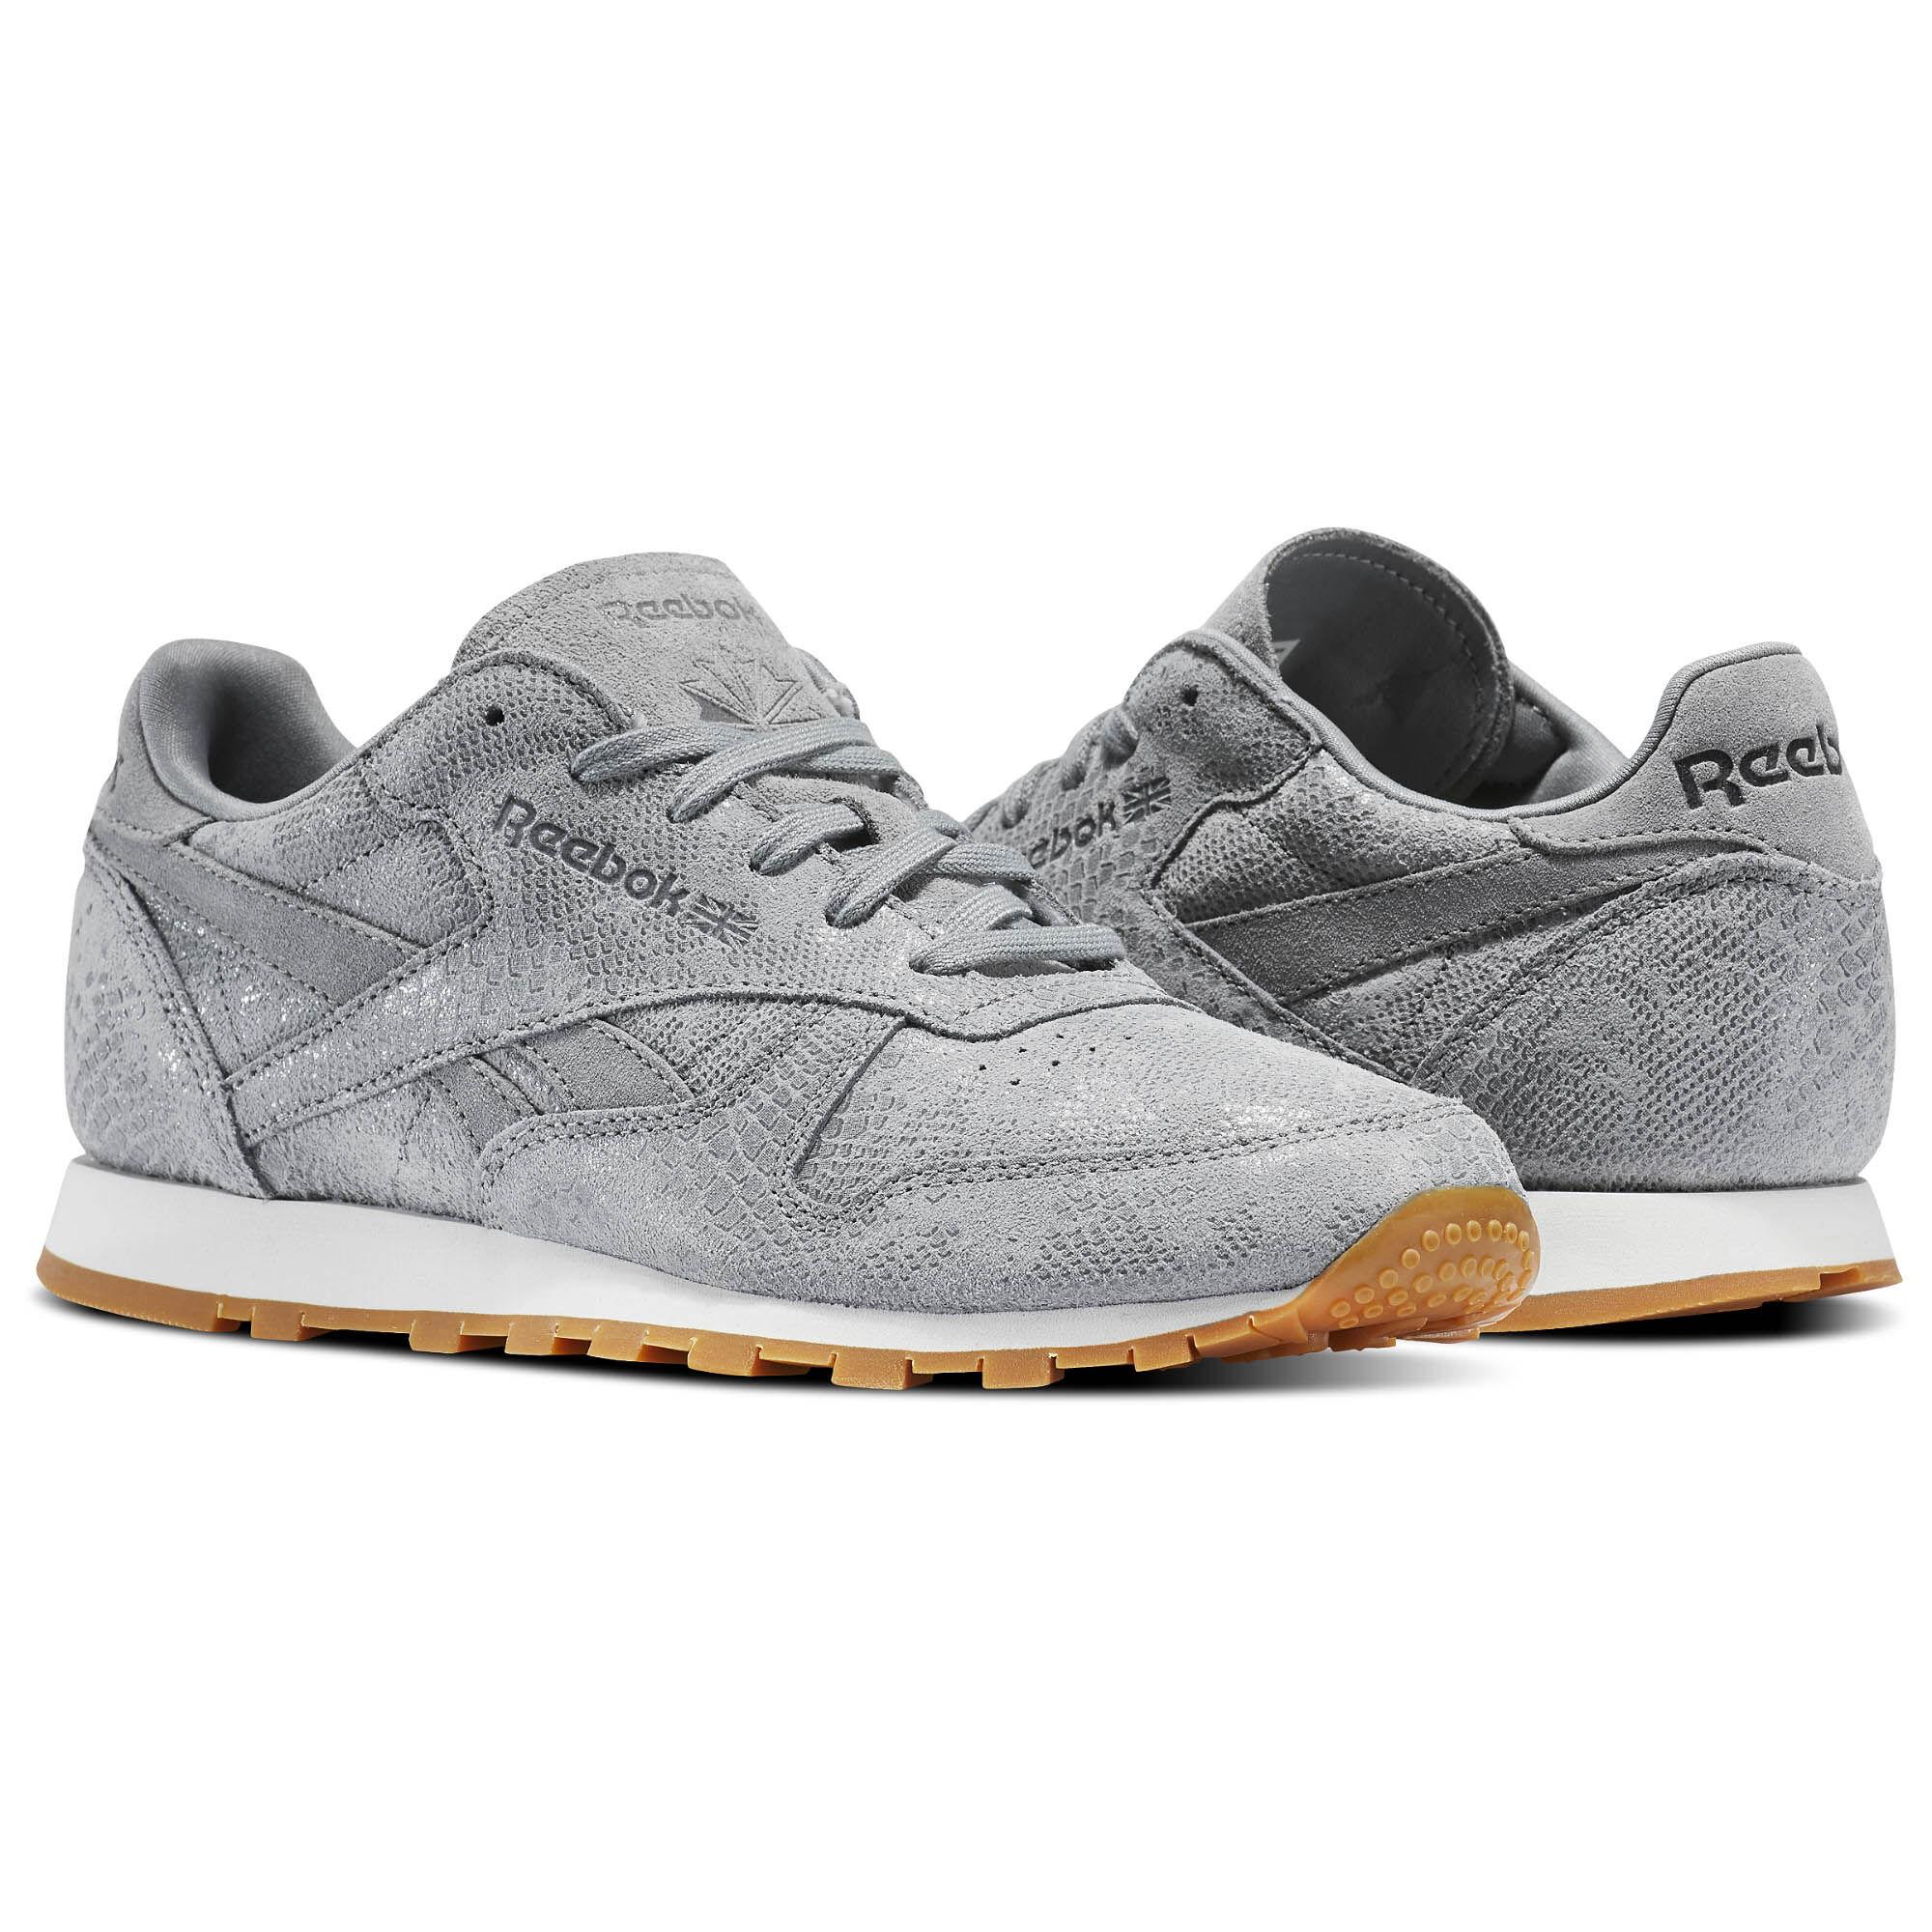 Reebok - Classic Leather Clean Exotics Flint Grey/Chalk/Gum BS8228